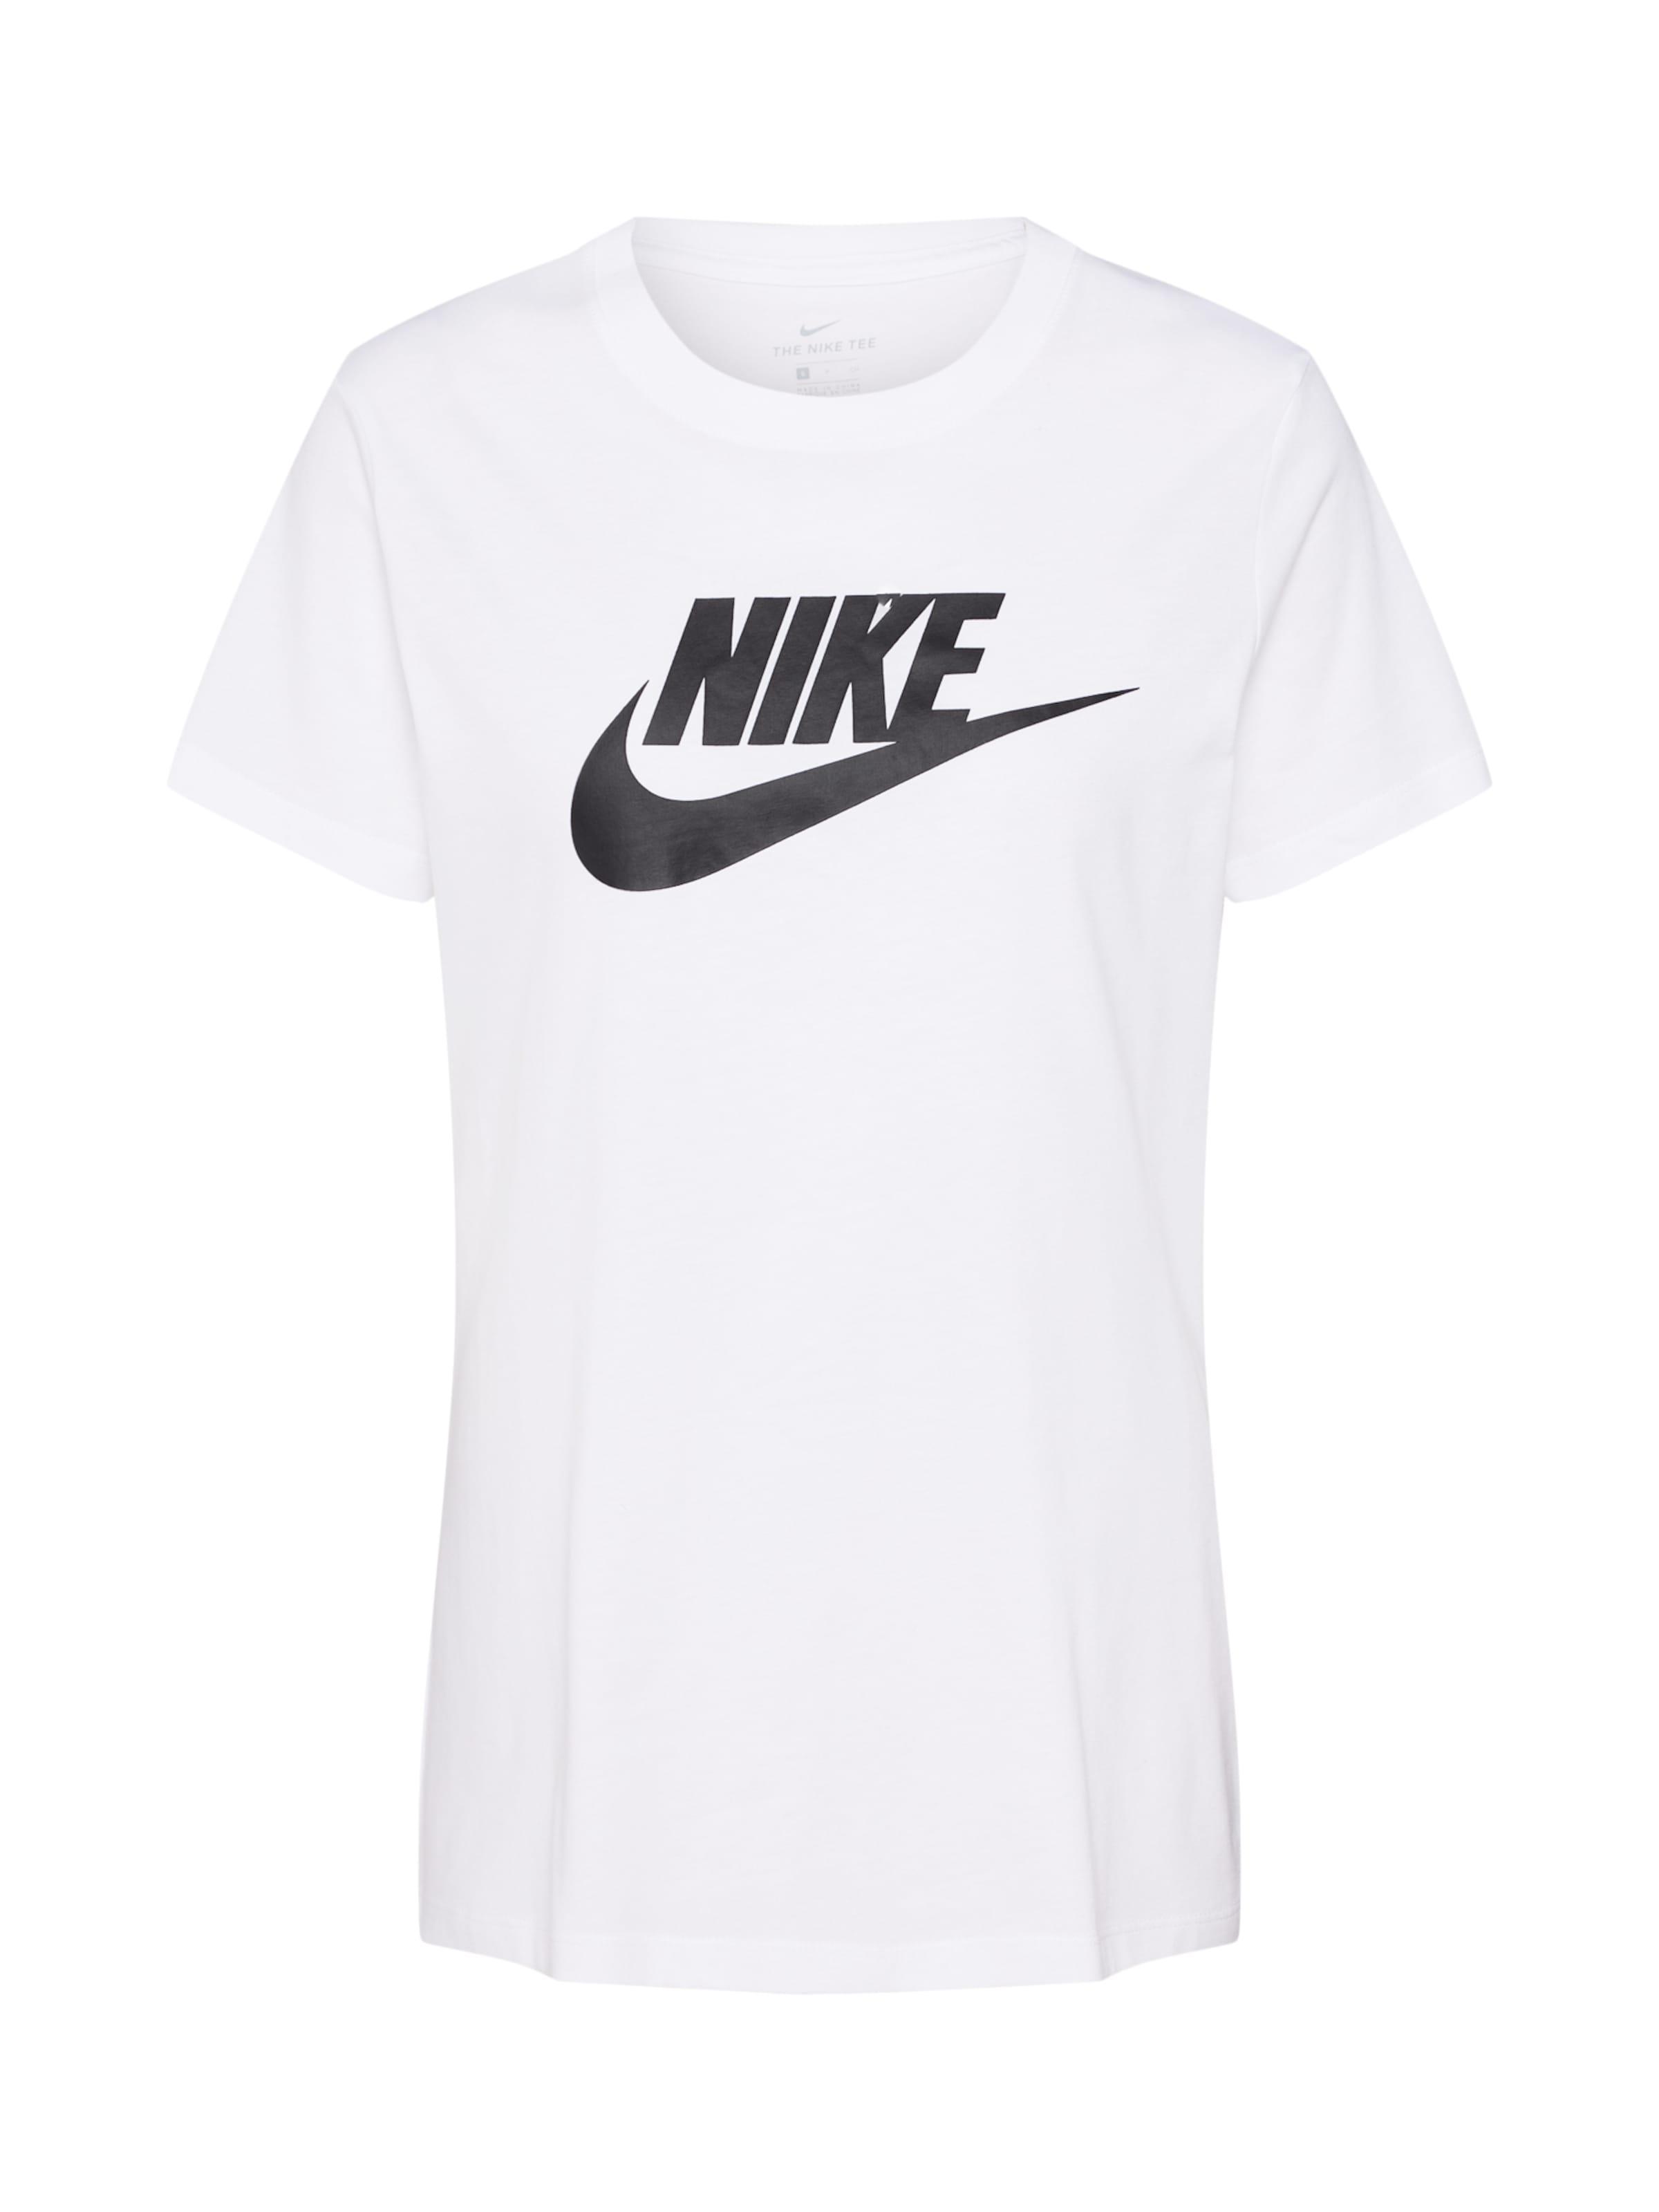 Sportswear 'futura' Nike SchwarzWeiß In Shirt hQtCdsr